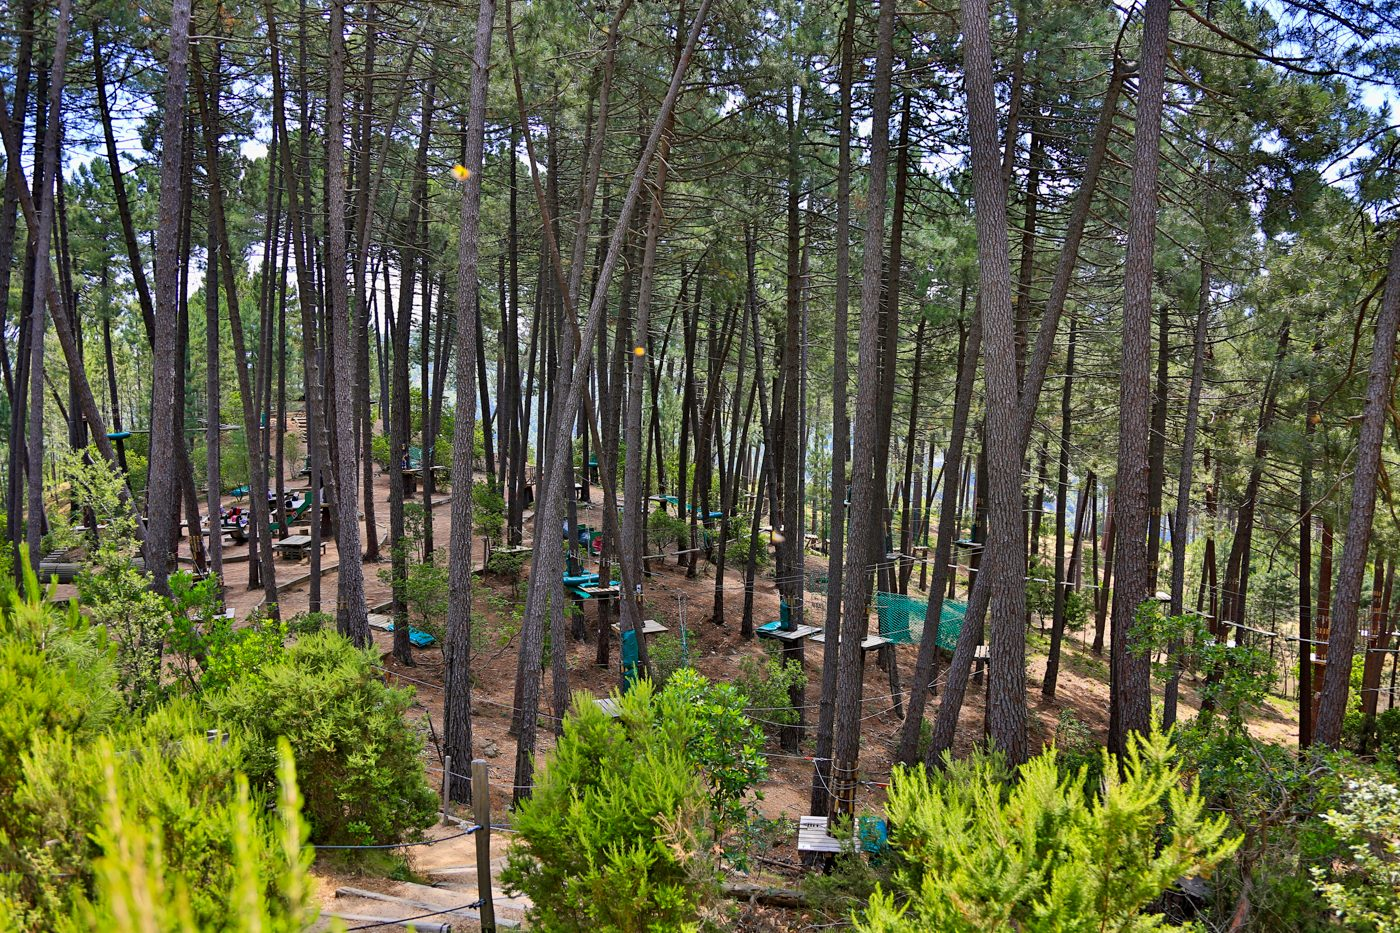 Parc aventure accrobranche de Vero en Corse